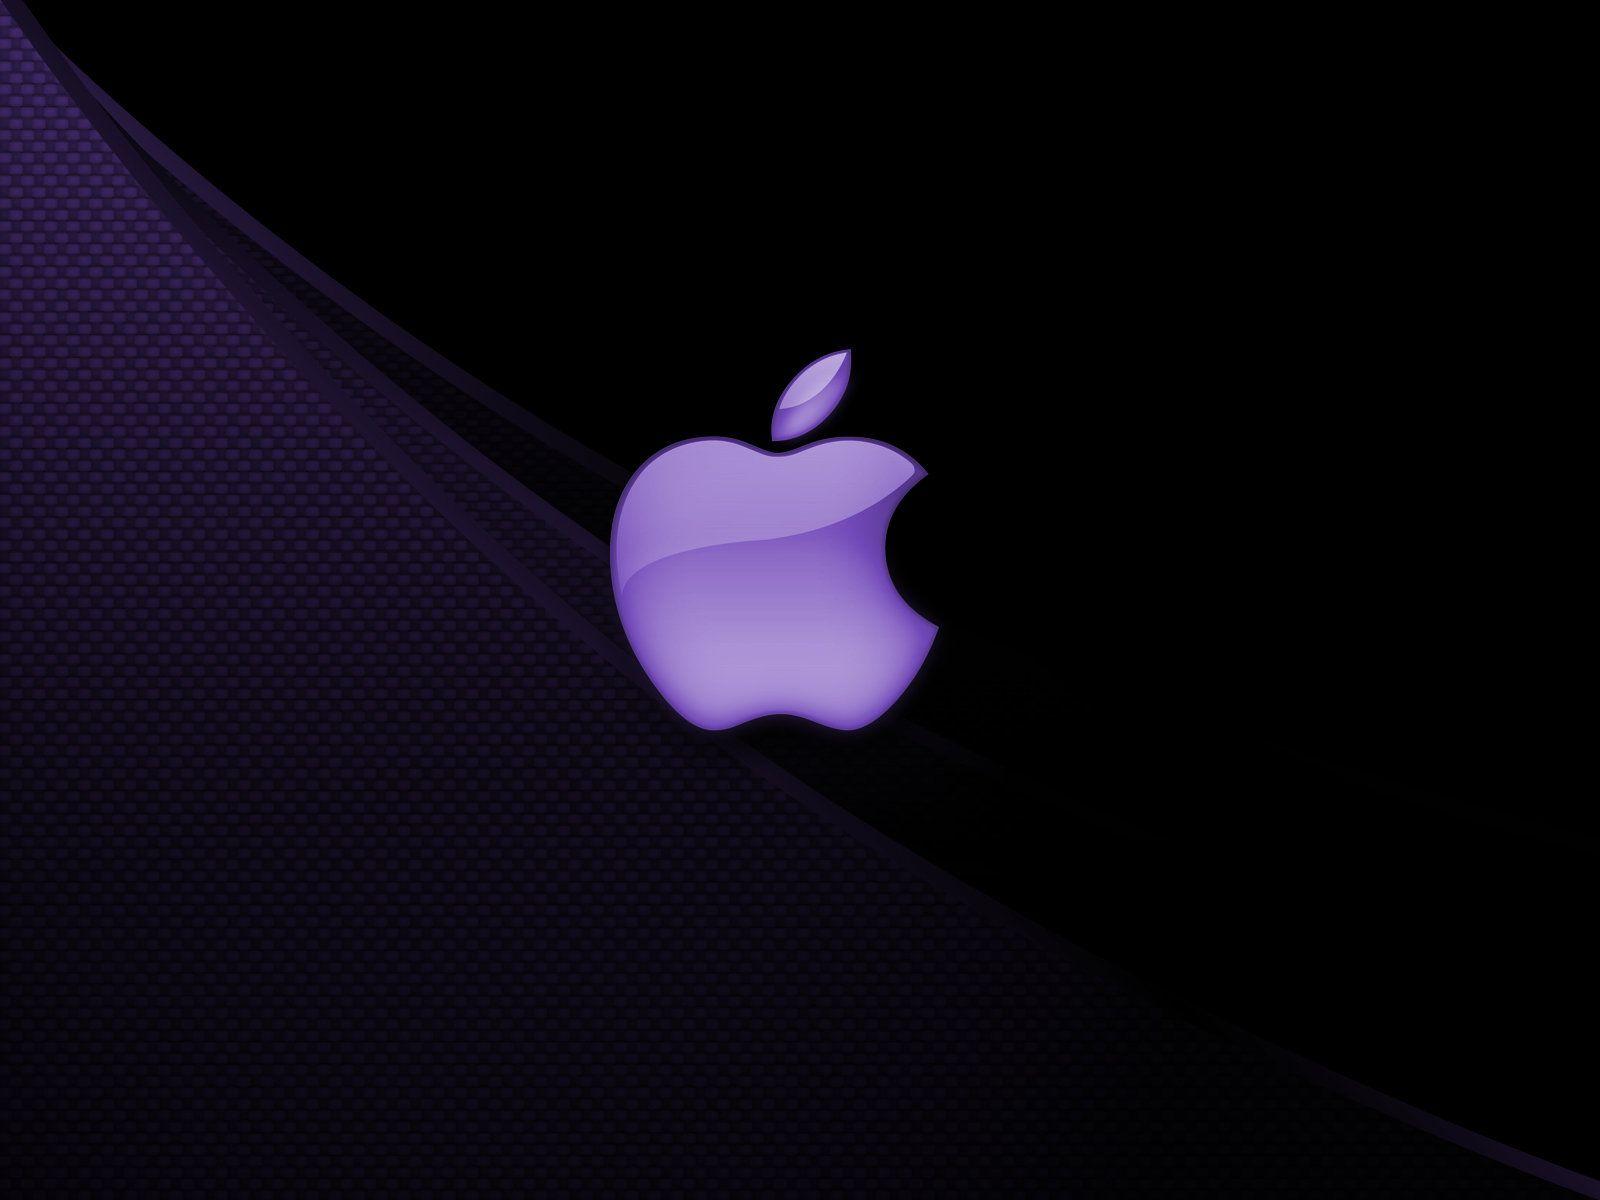 Beautiful Wallpaper Macbook Purple - ab76af6fd8aea8c8324c571a6c91086a  Snapshot_563839.jpg